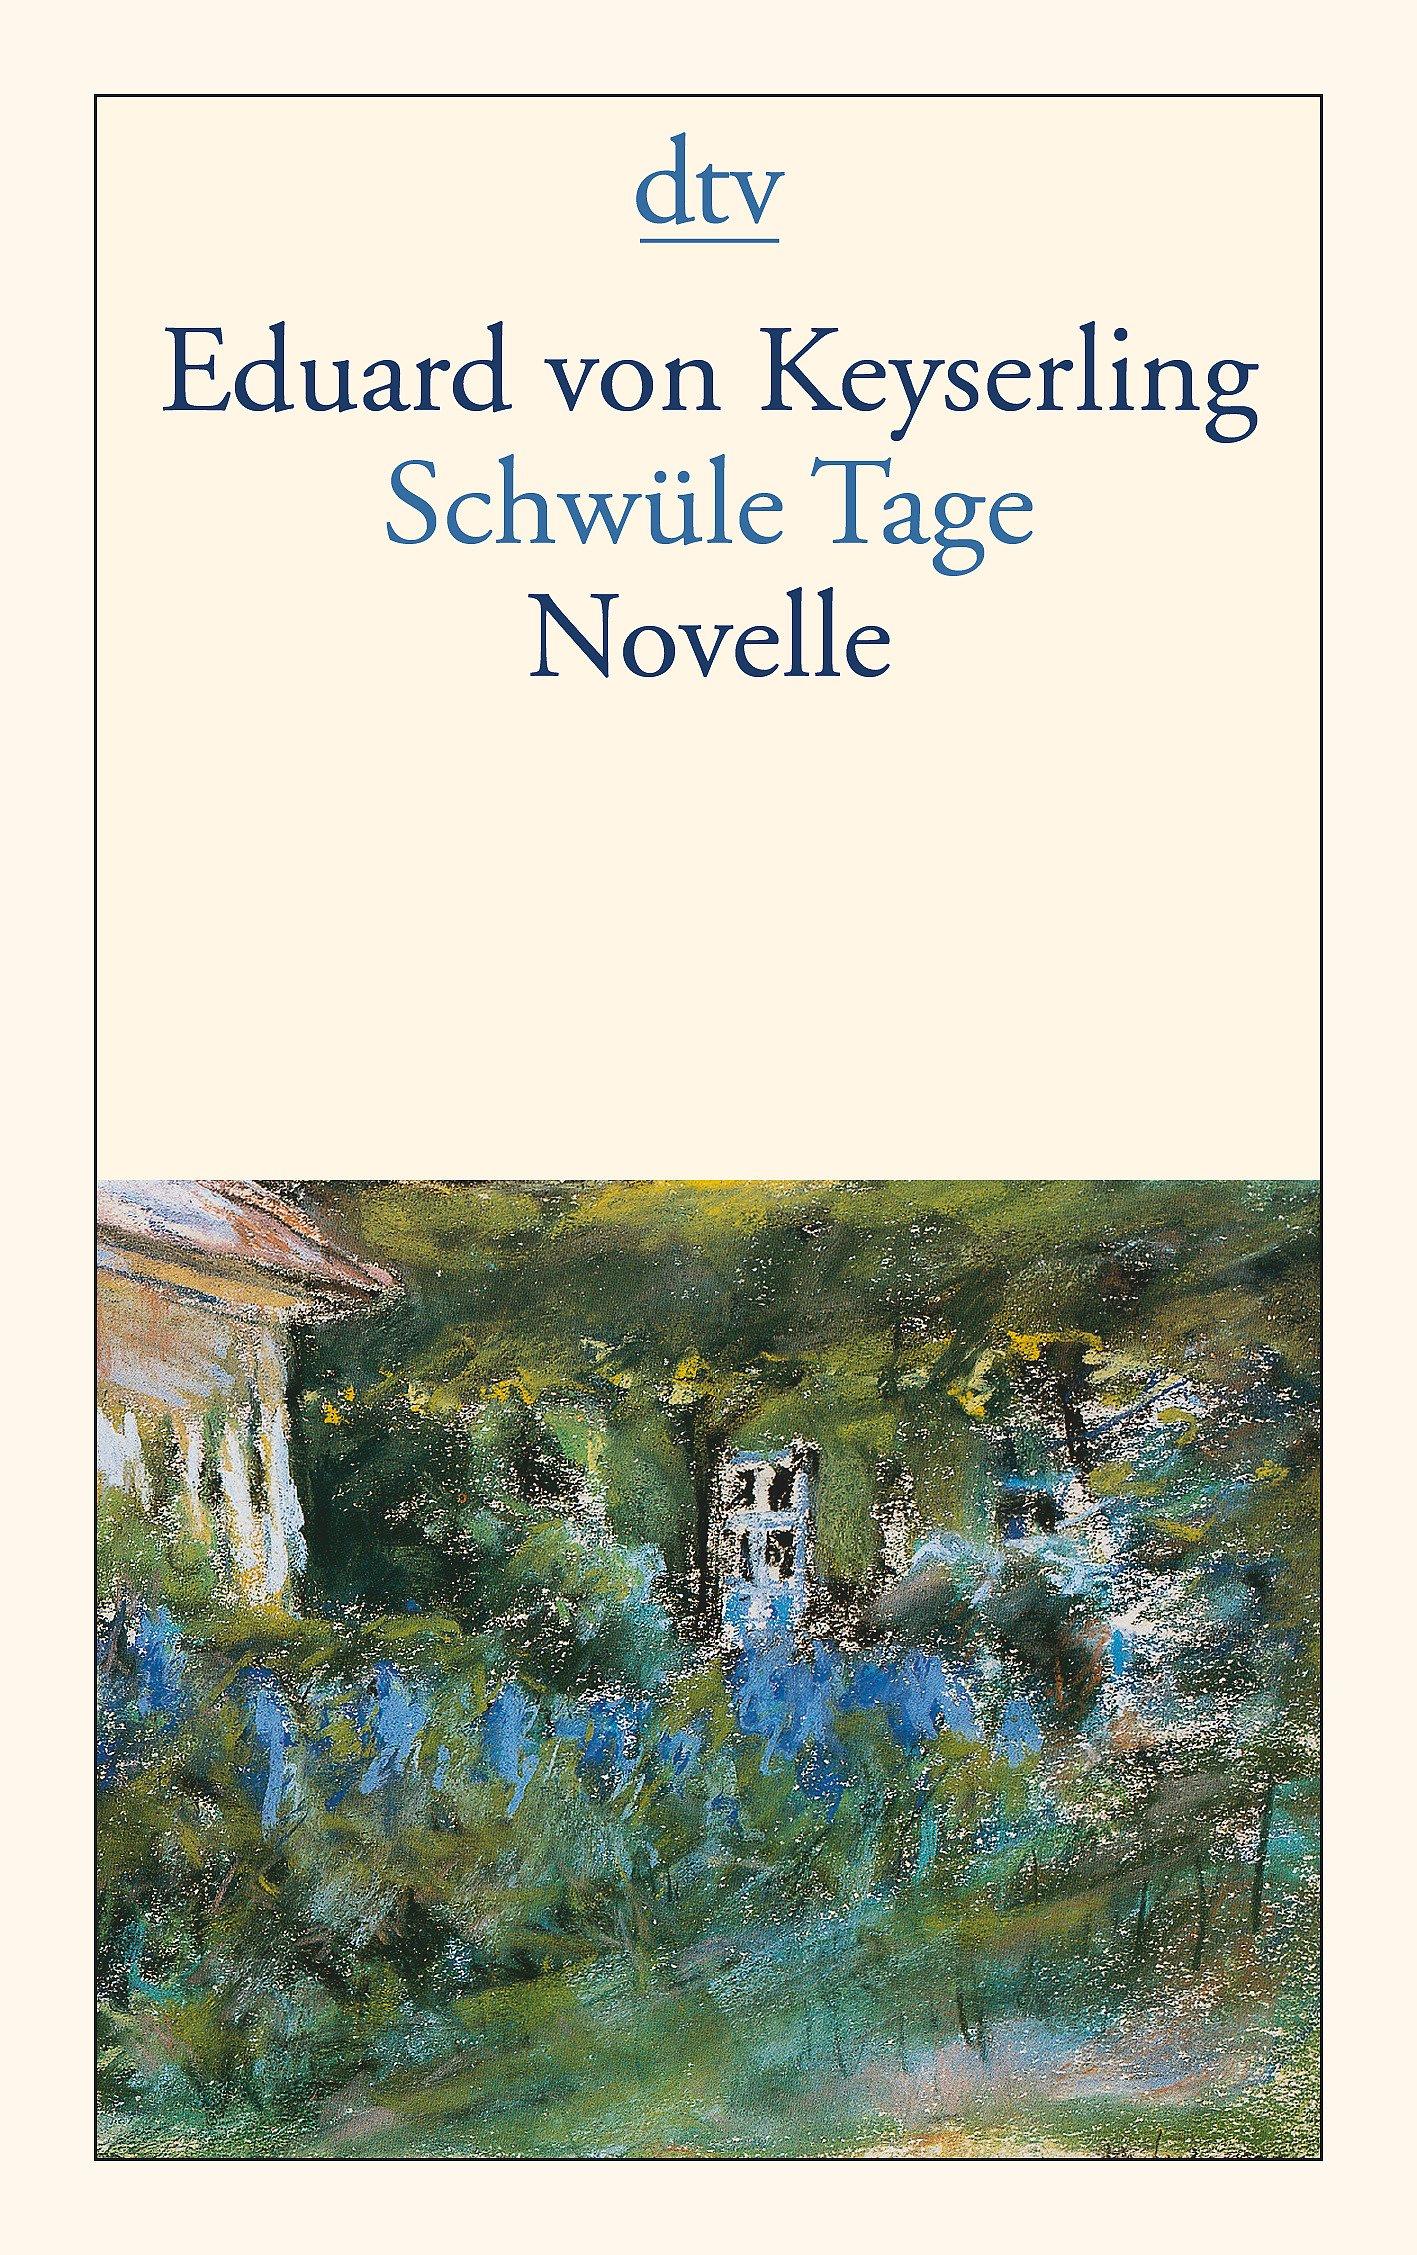 Schwüle Tage: Novelle